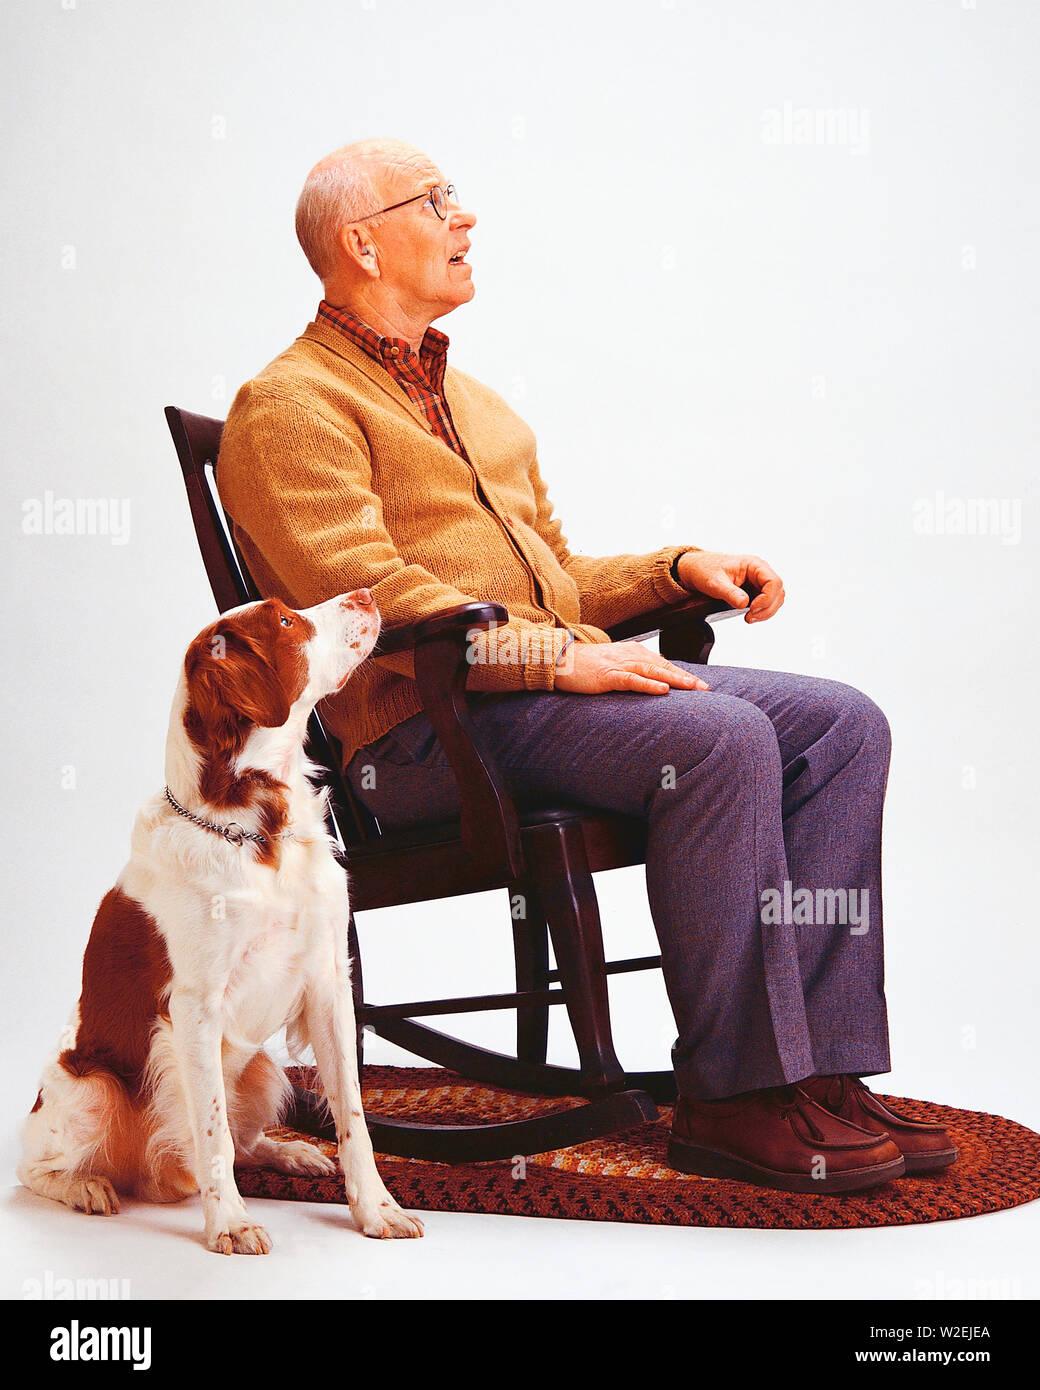 Wondrous Senior Male Sitting In A Rocking Chair With A Dog Next To Frankydiablos Diy Chair Ideas Frankydiabloscom